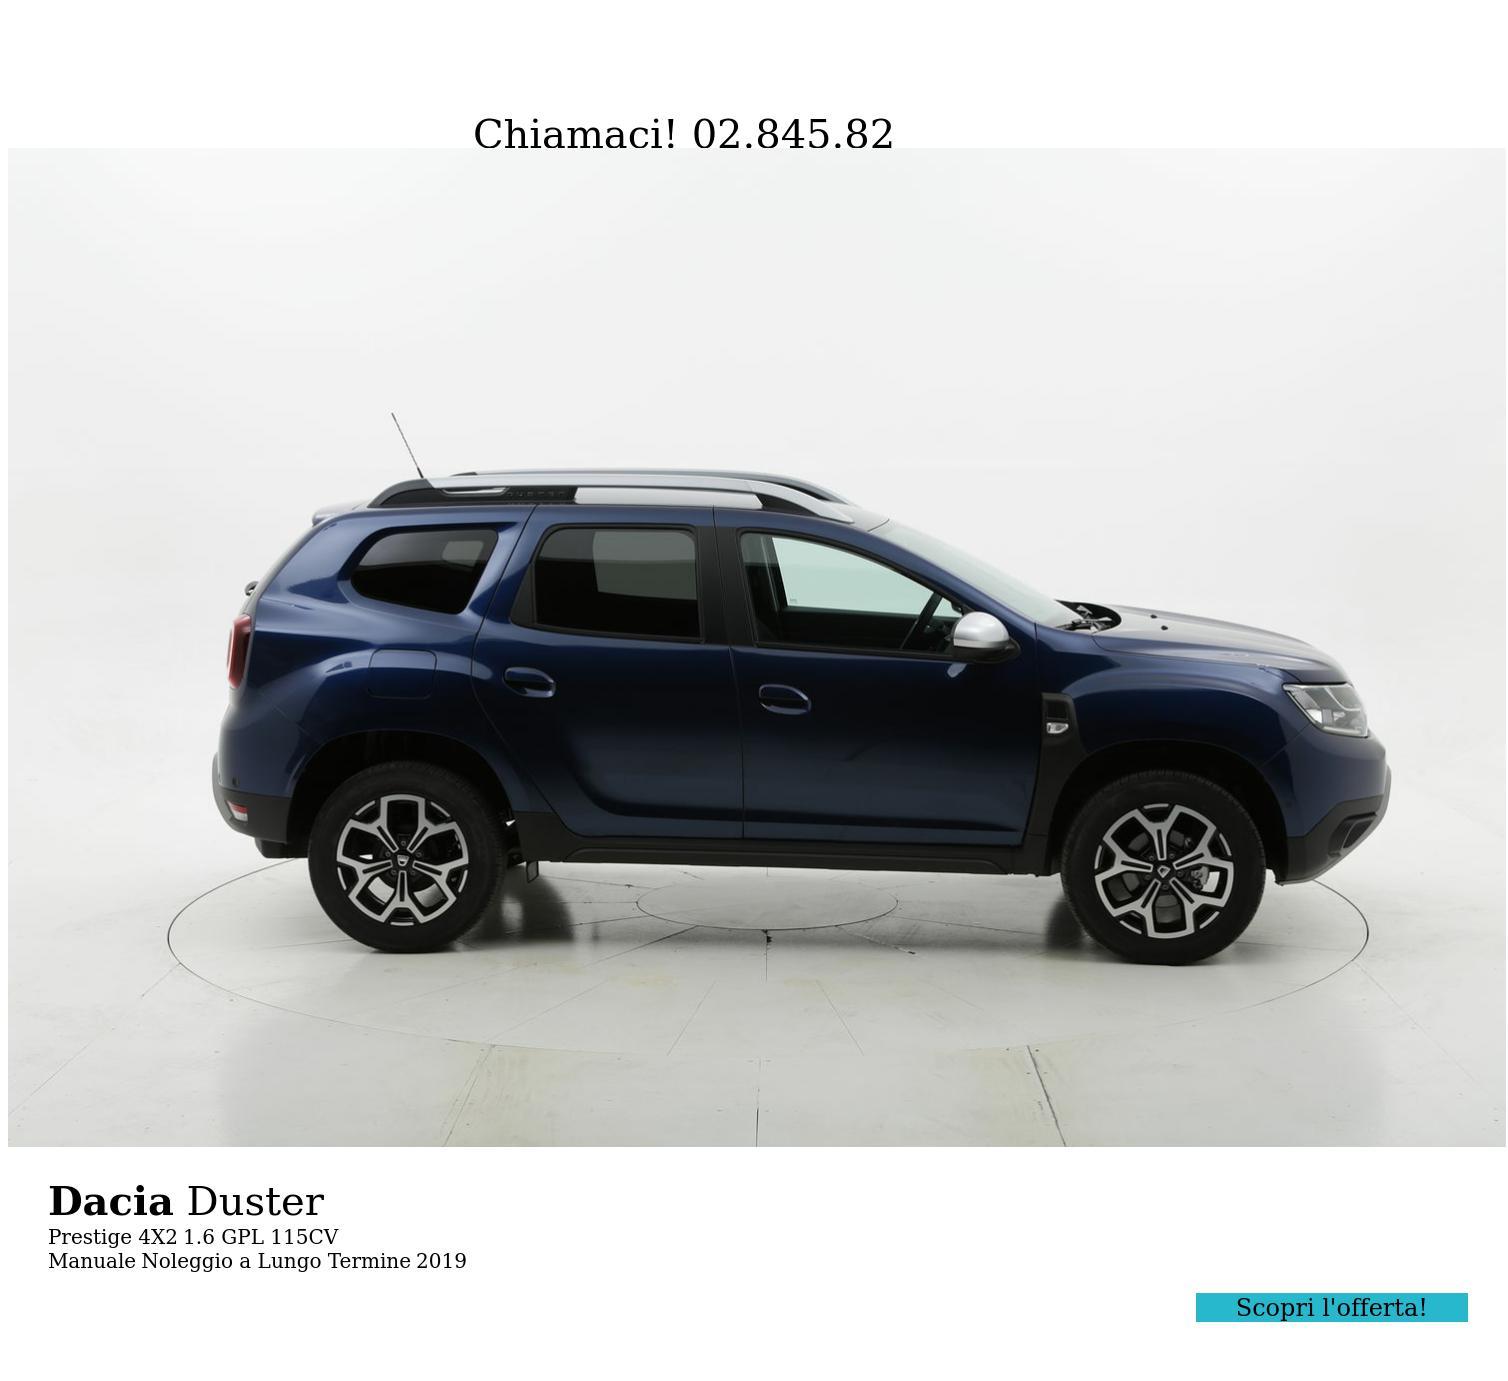 Dacia Duster gpl blu a noleggio a lungo termine | brumbrum